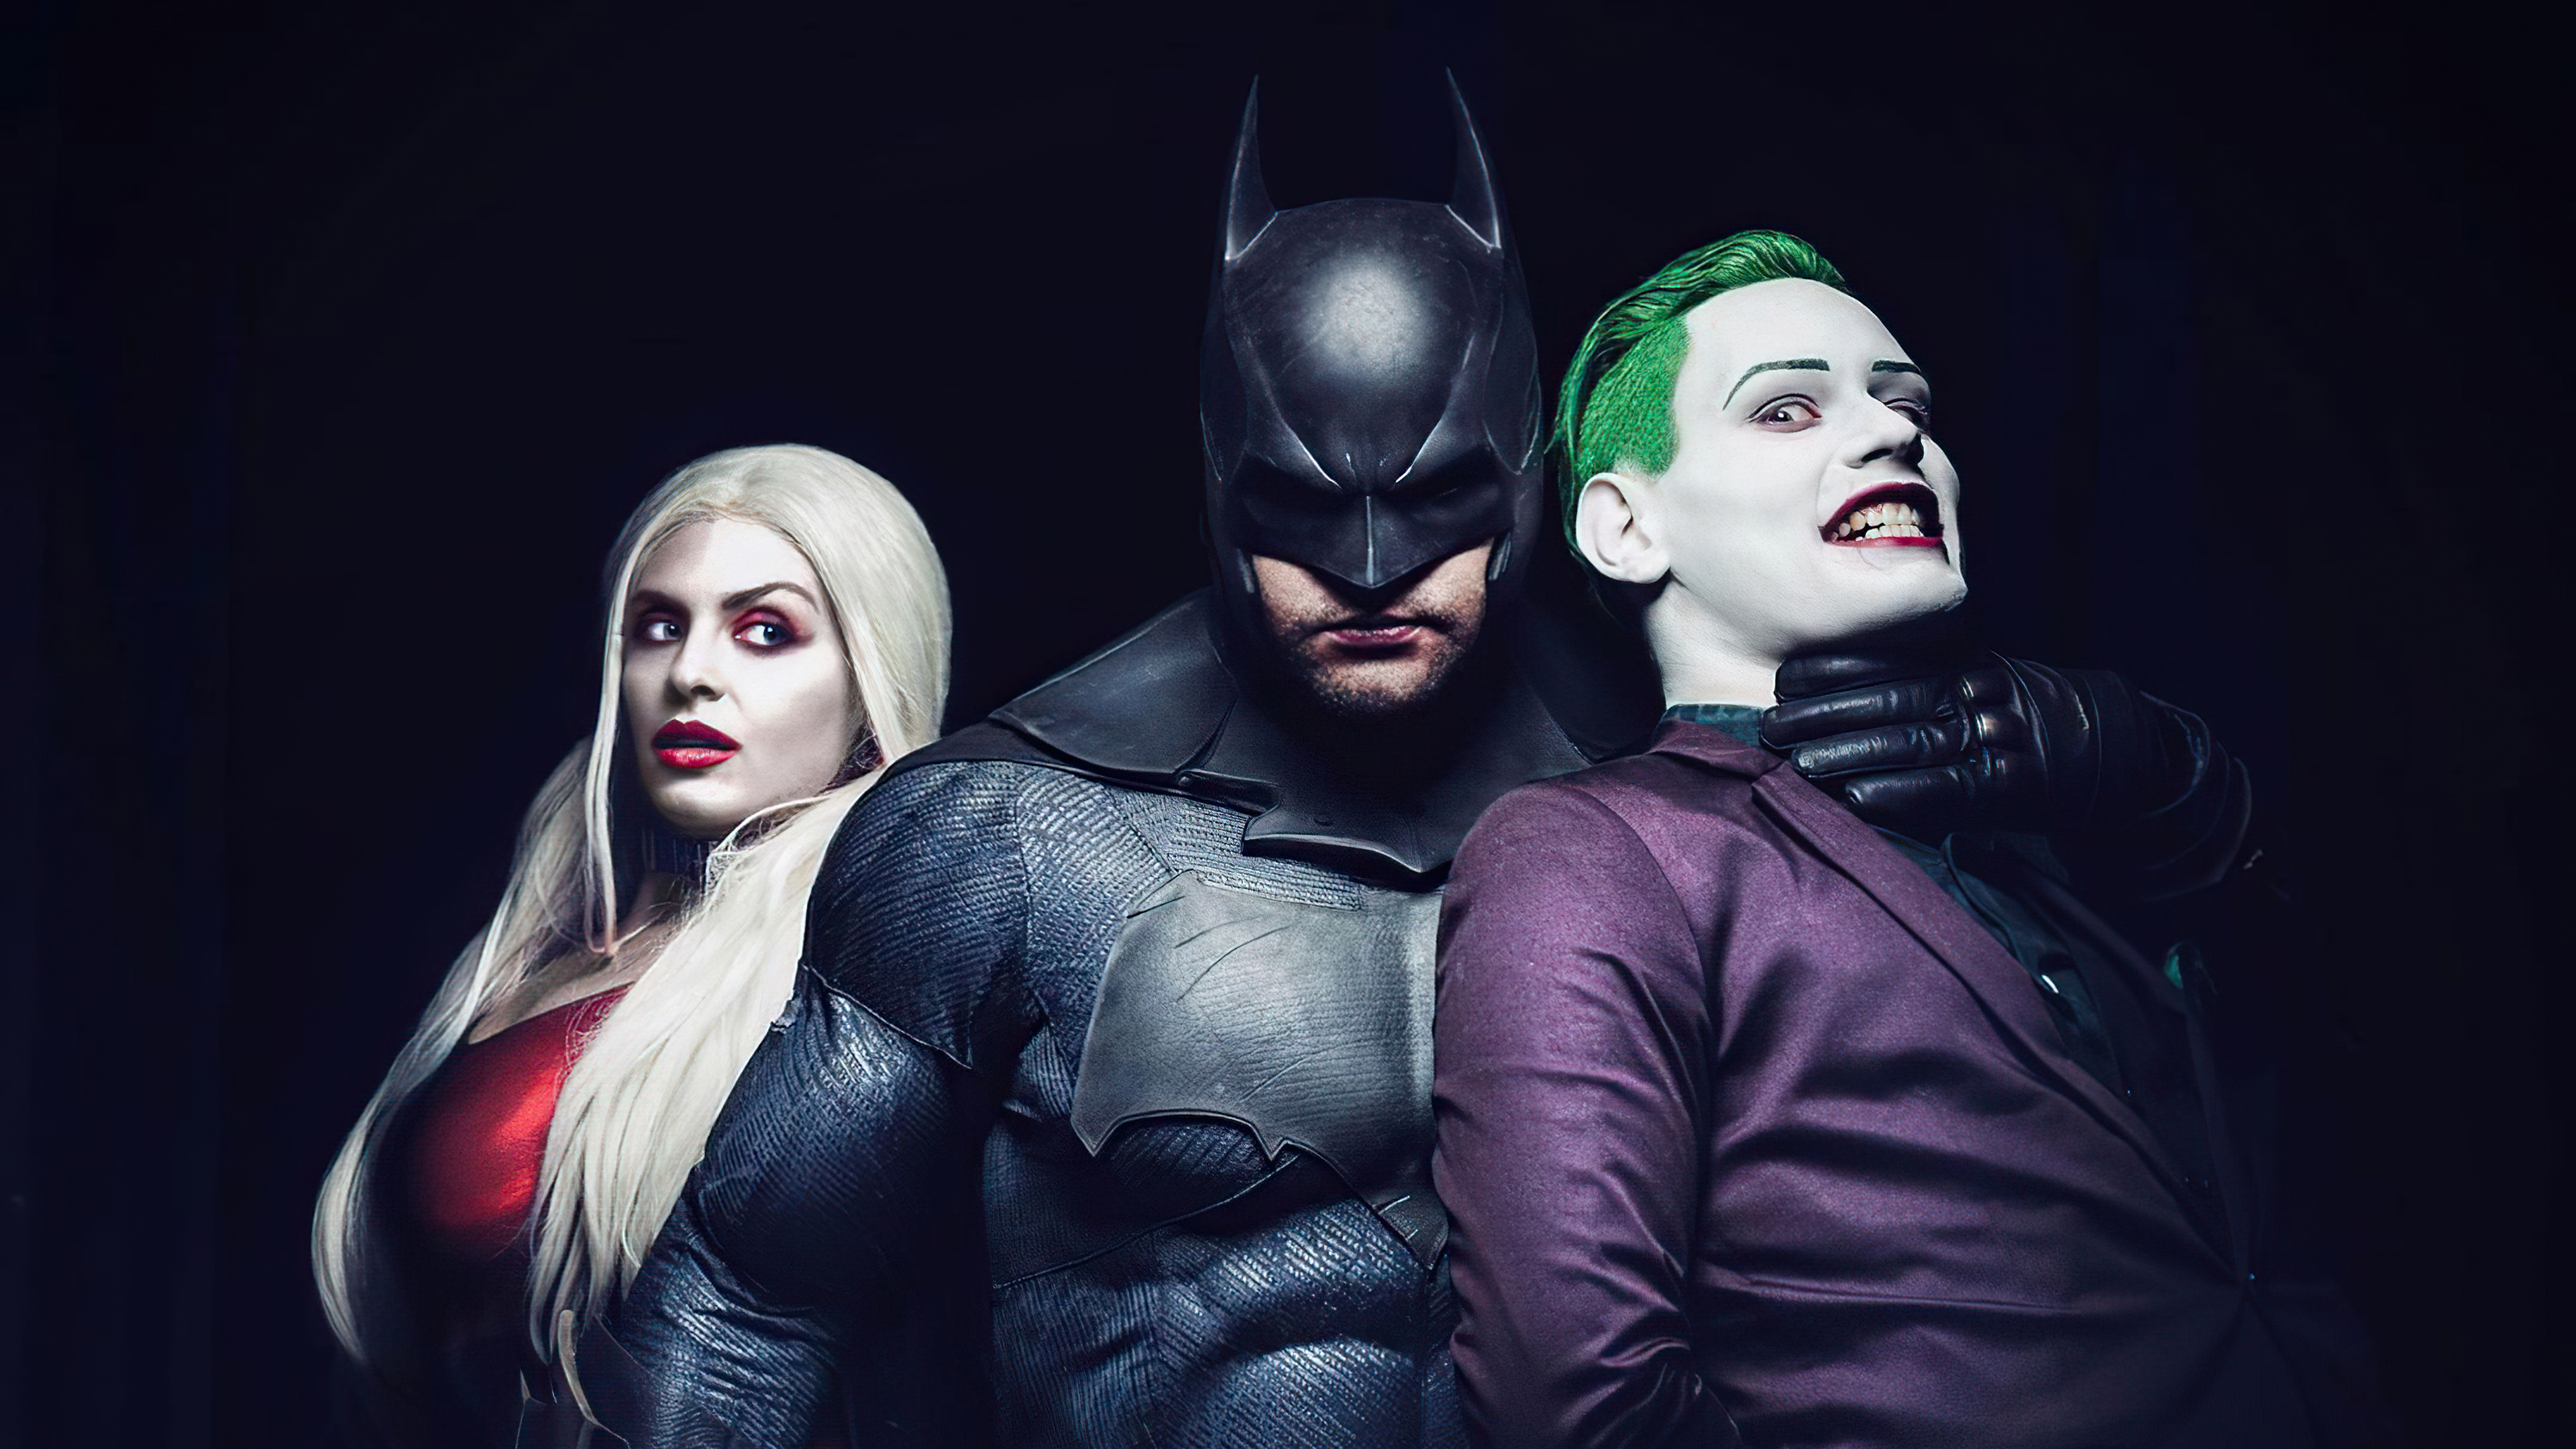 joker batman and harley quinn cosplay 4k 1617446710 - Joker Batman And Harley Quinn Cosplay 4k - Joker Batman And Harley Quinn Cosplay 4k wallpapers